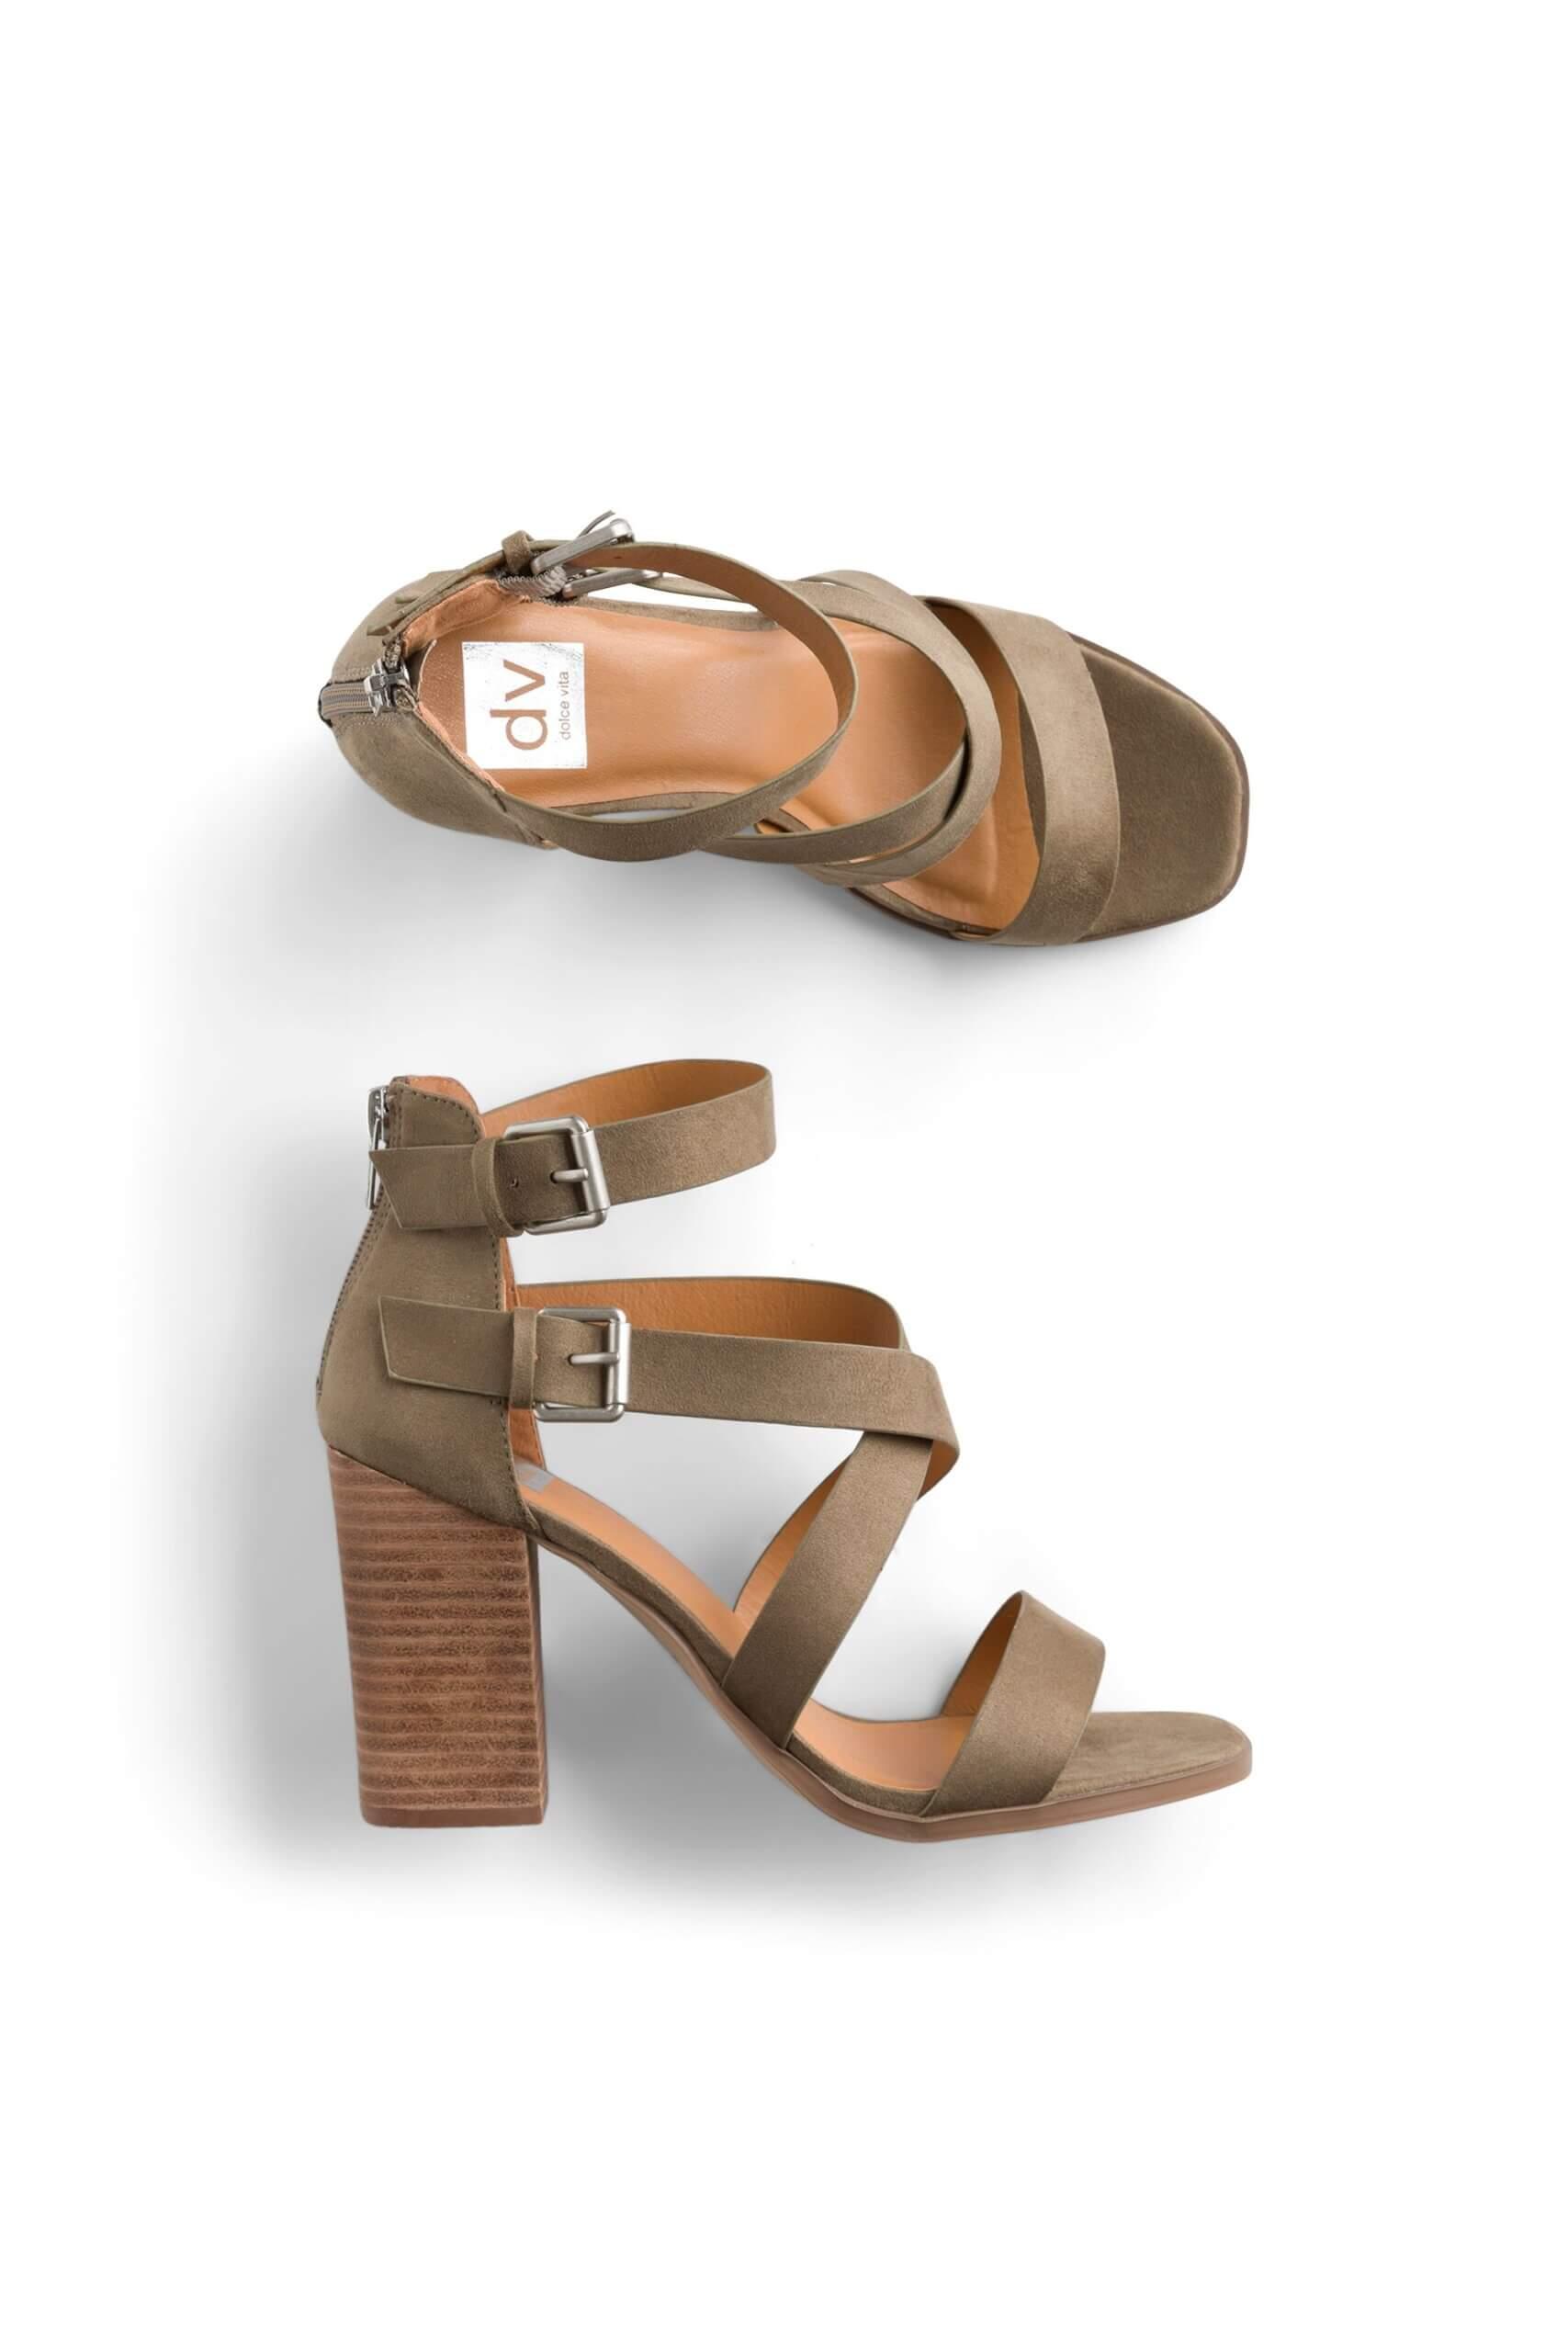 Stitch Fix Women's taupe block heel sandals.